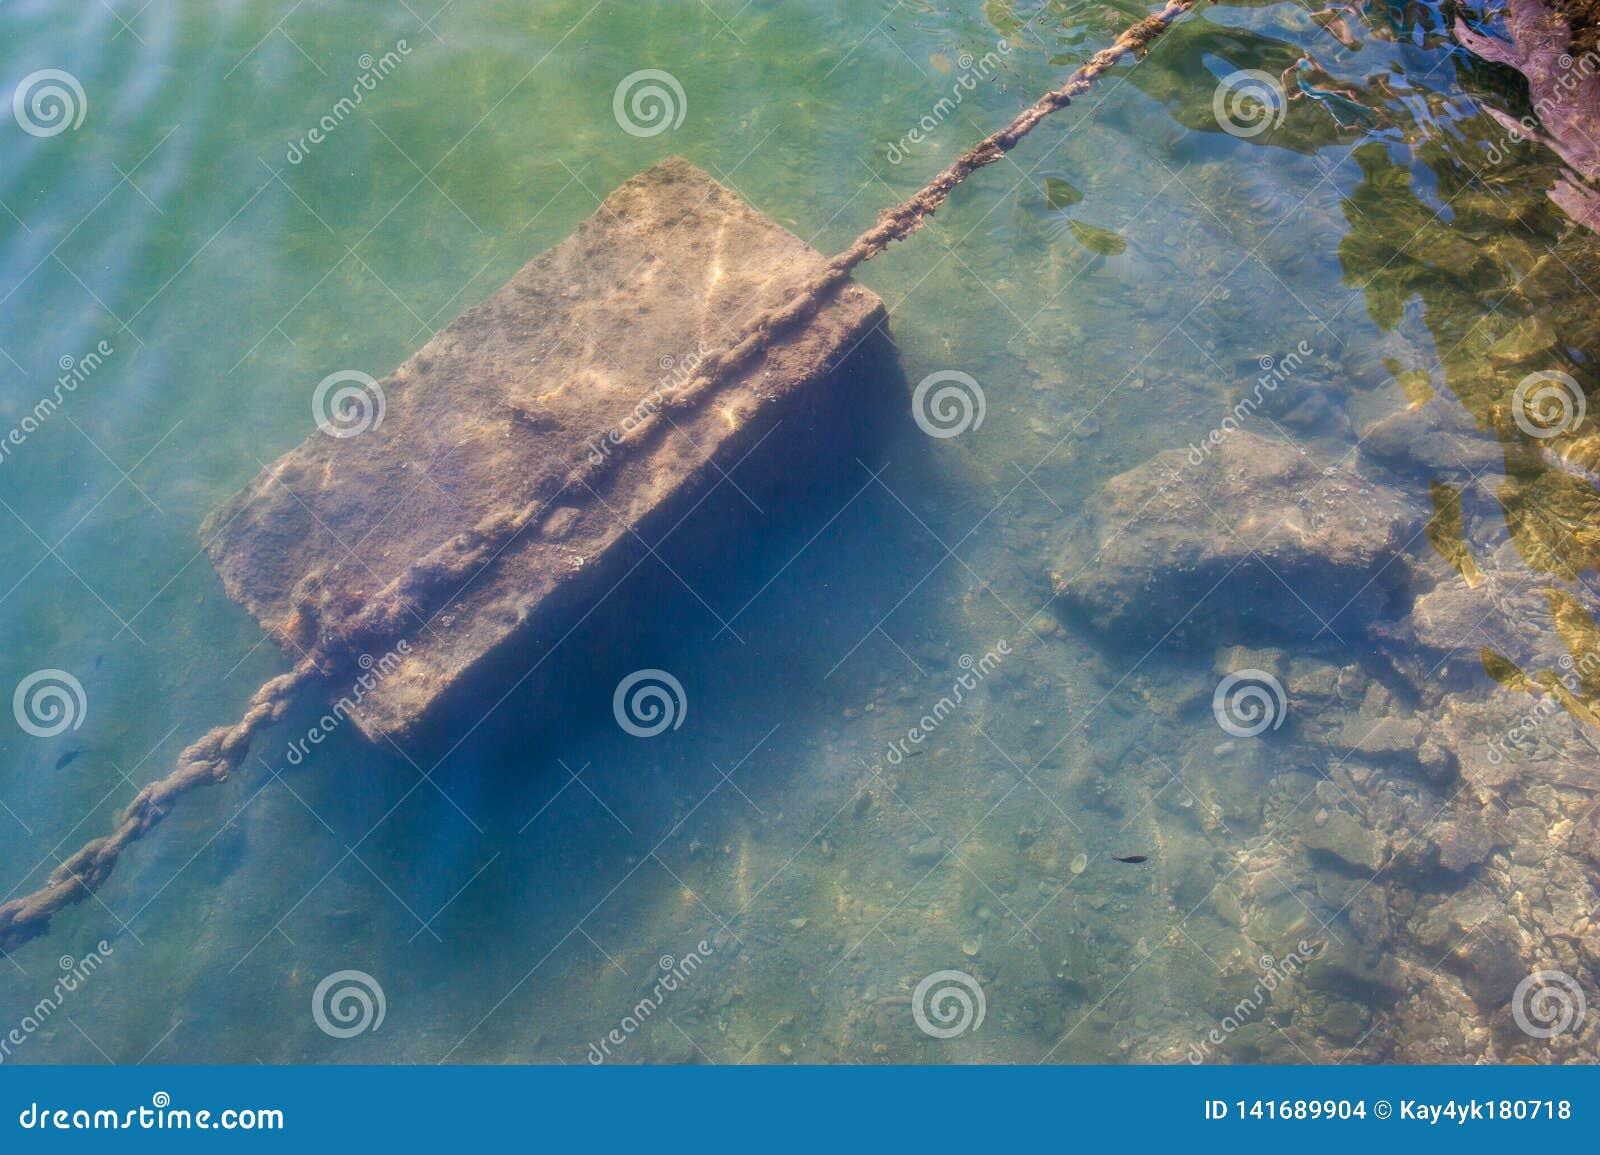 Corrente oxidada sob a água, âncora amarre na costa